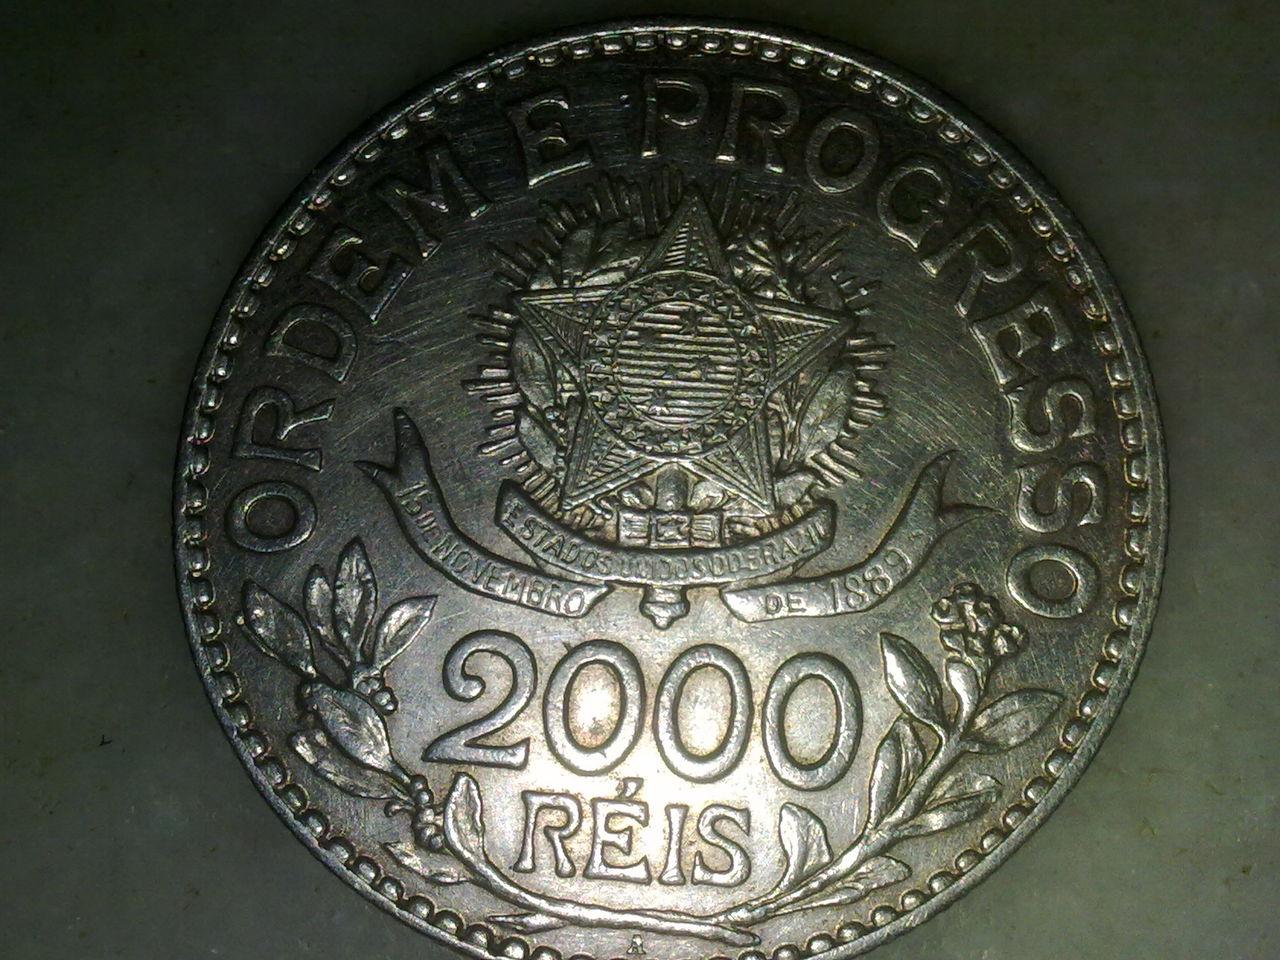 2000 Reis 1907 Brasil Pppppppp_003